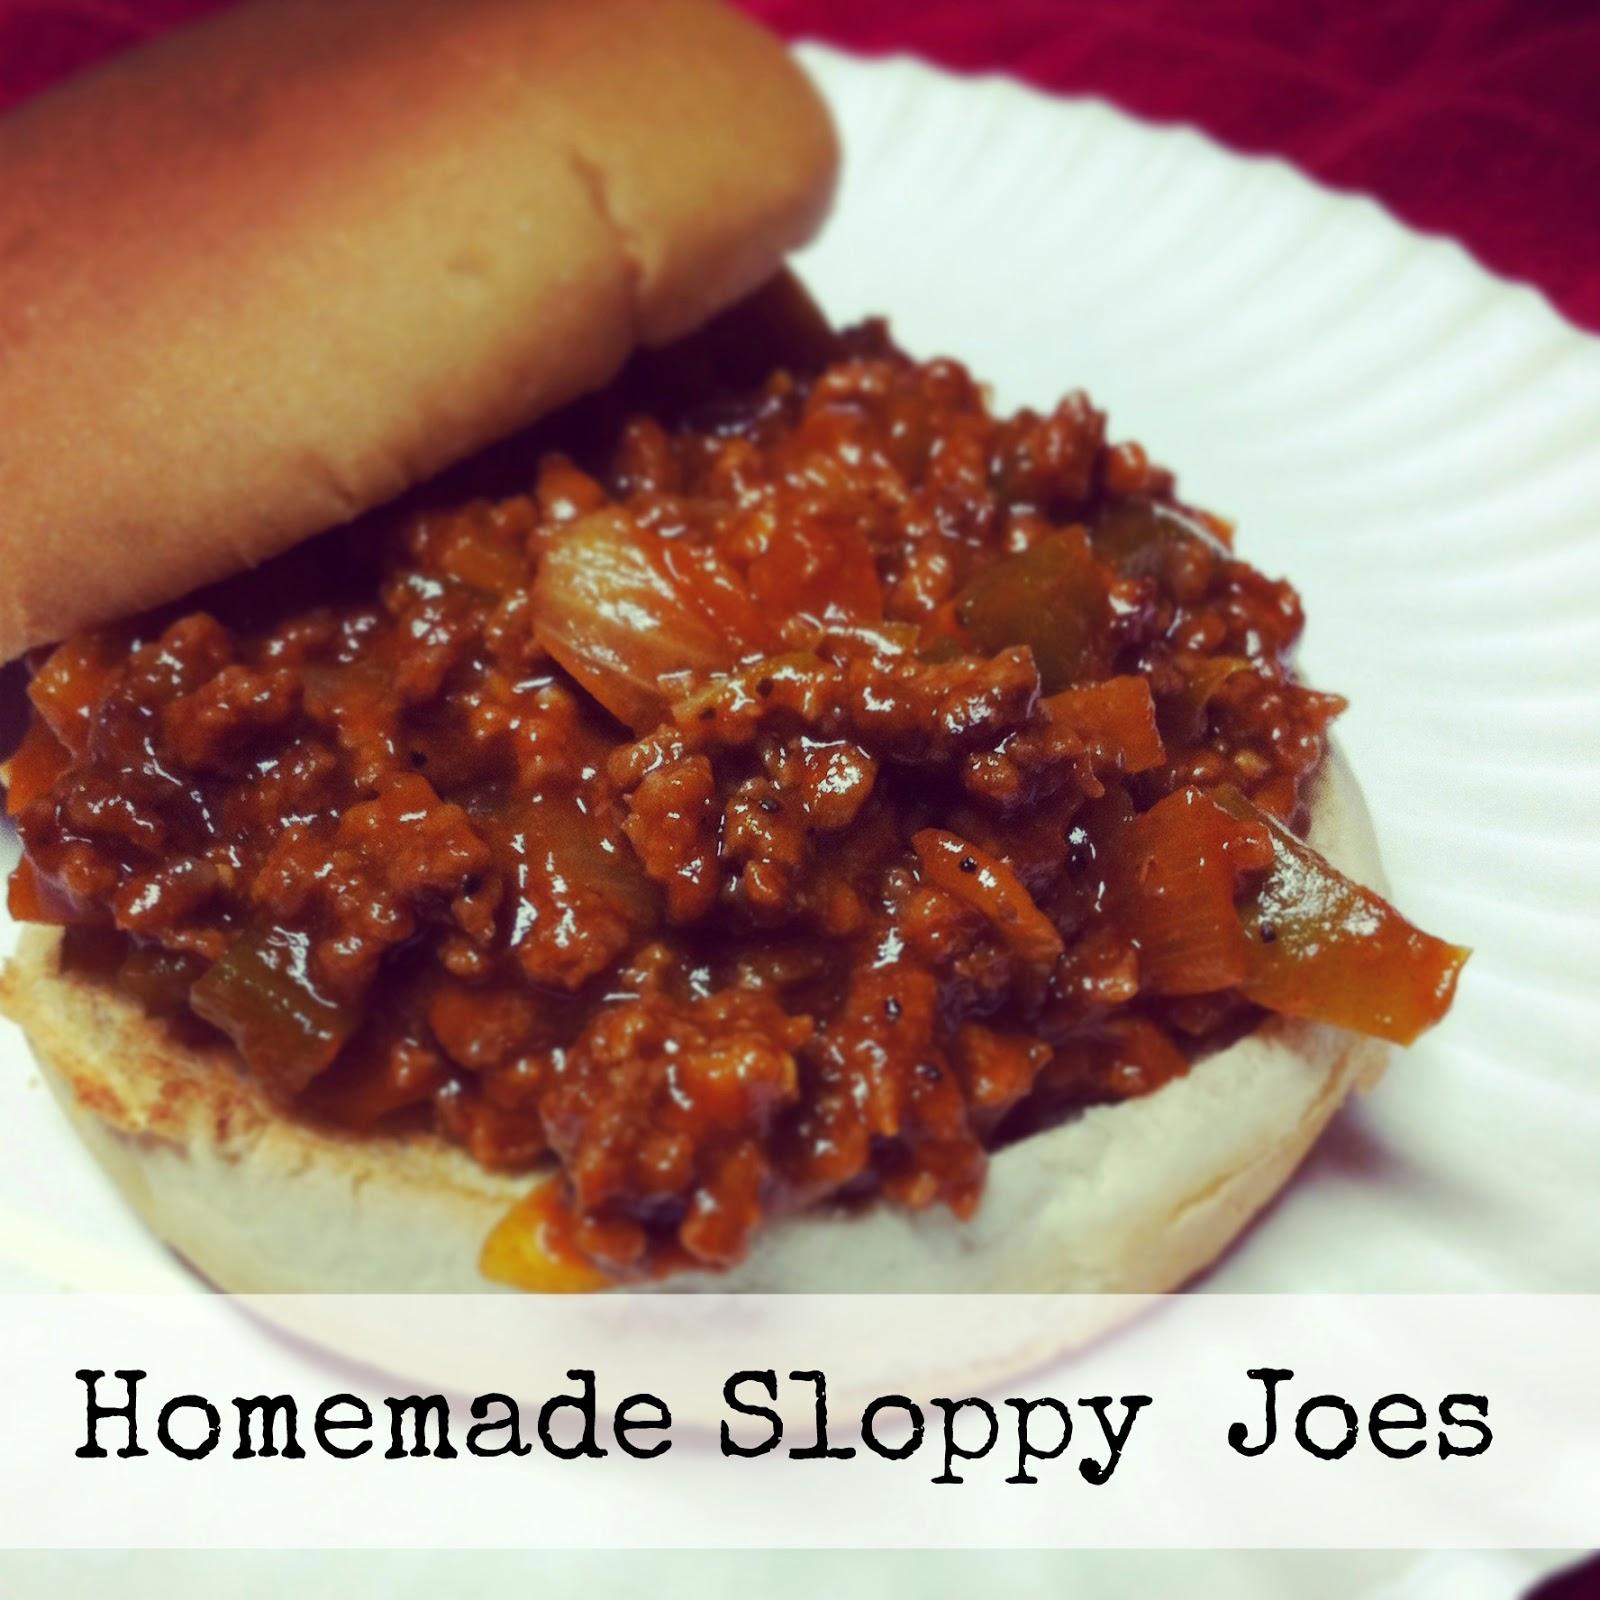 homemade sloppy joes hickory ridge studio